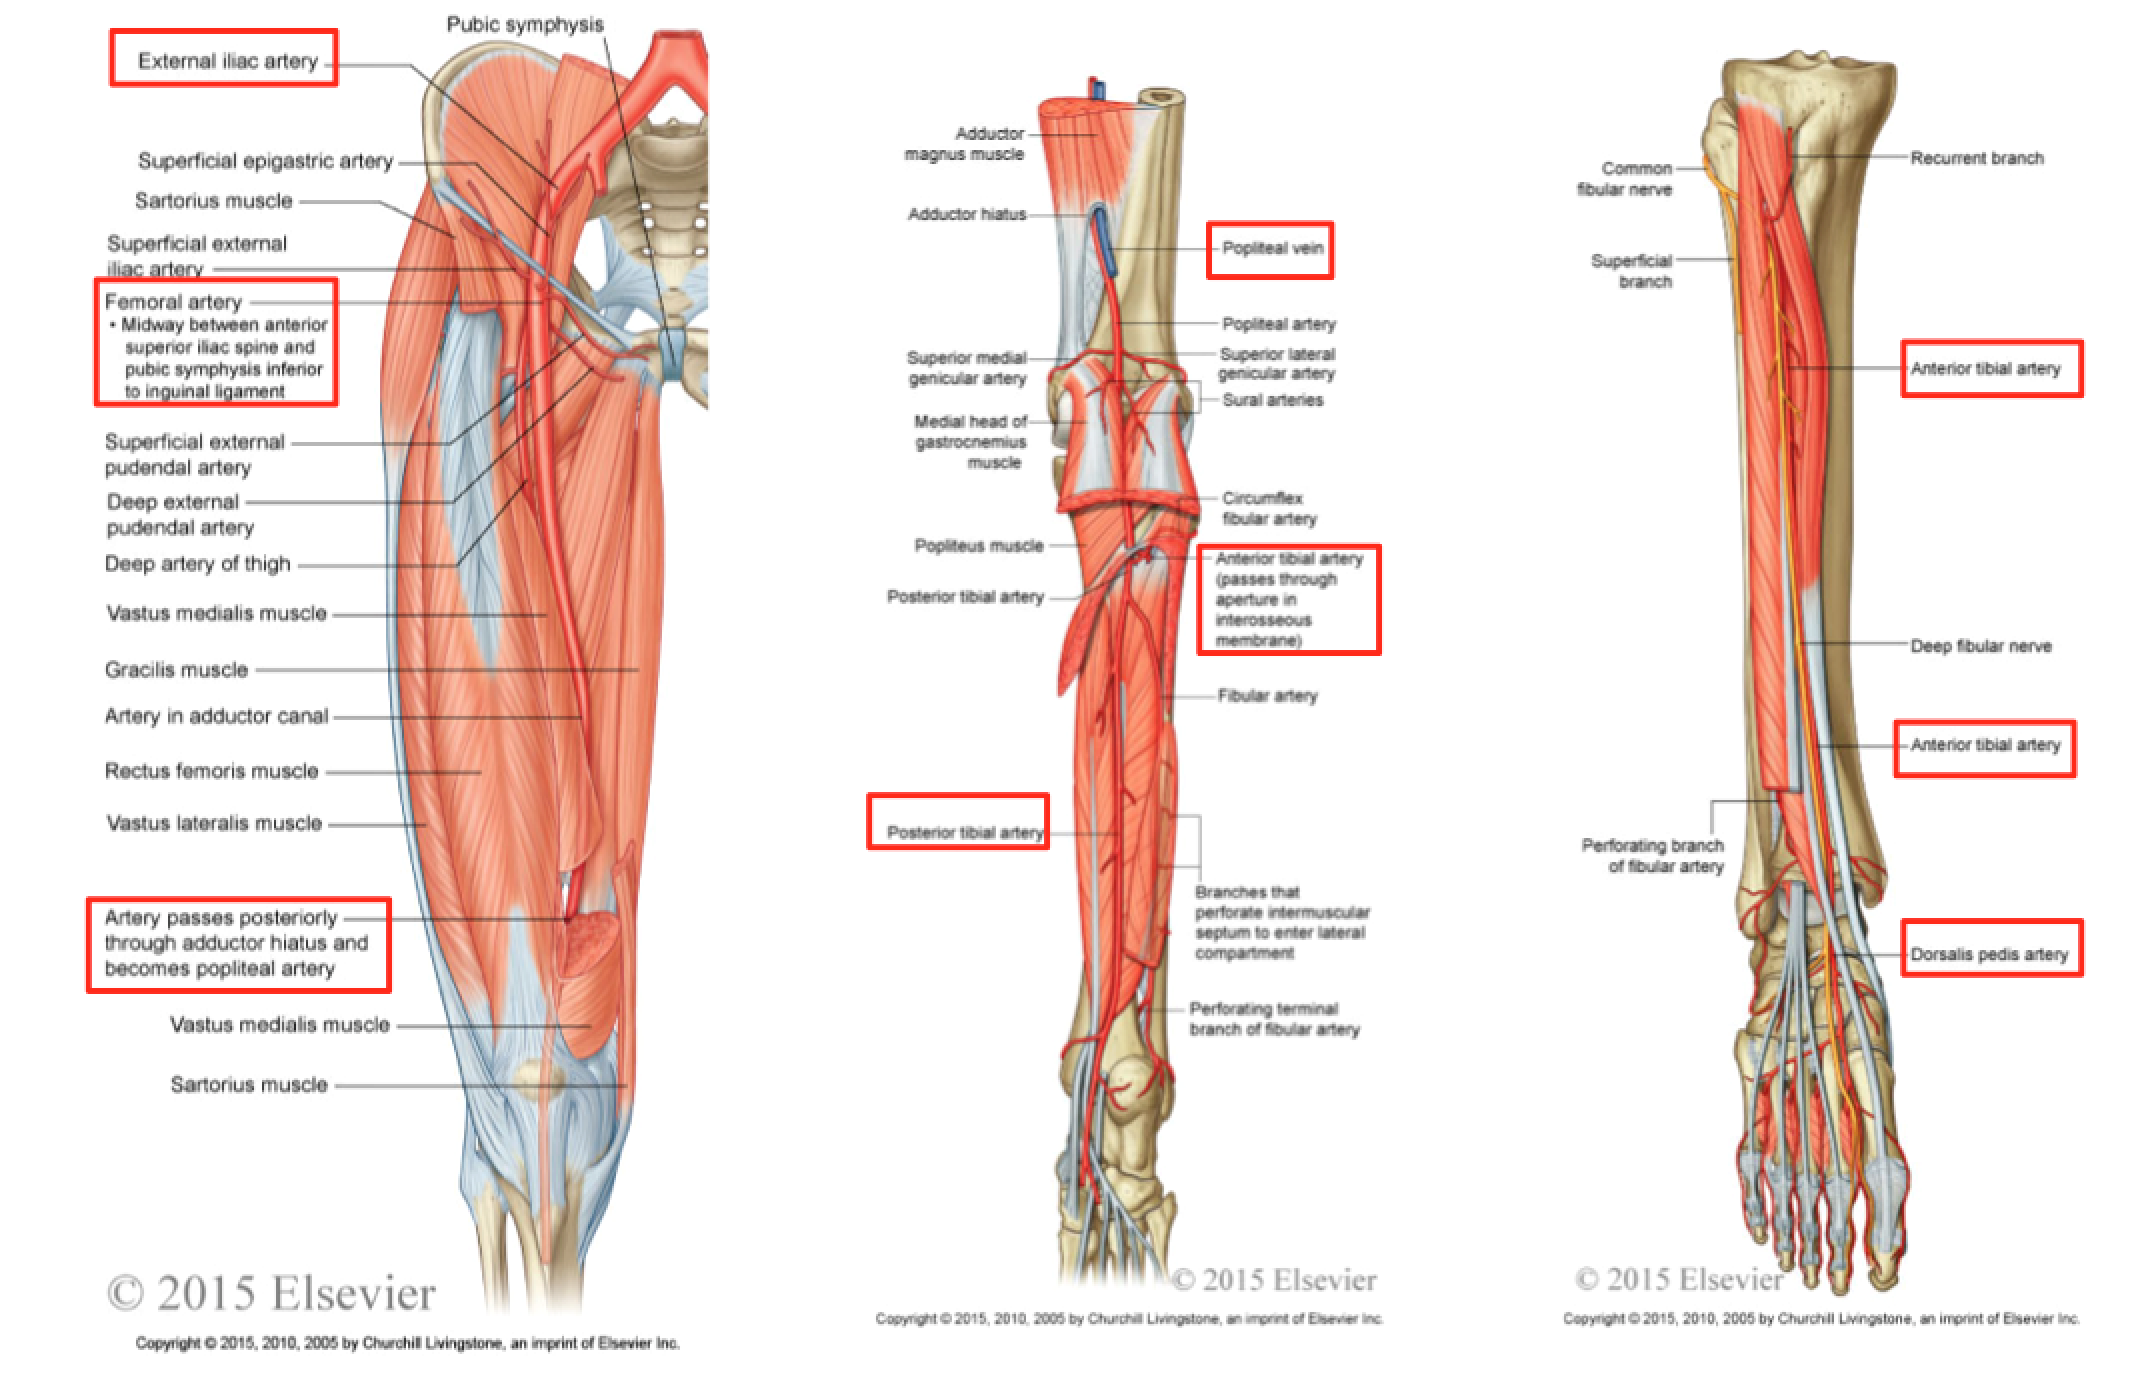 Anatomy Skin Subcutaneous Tissue Ii Foundation 1 Wk 3